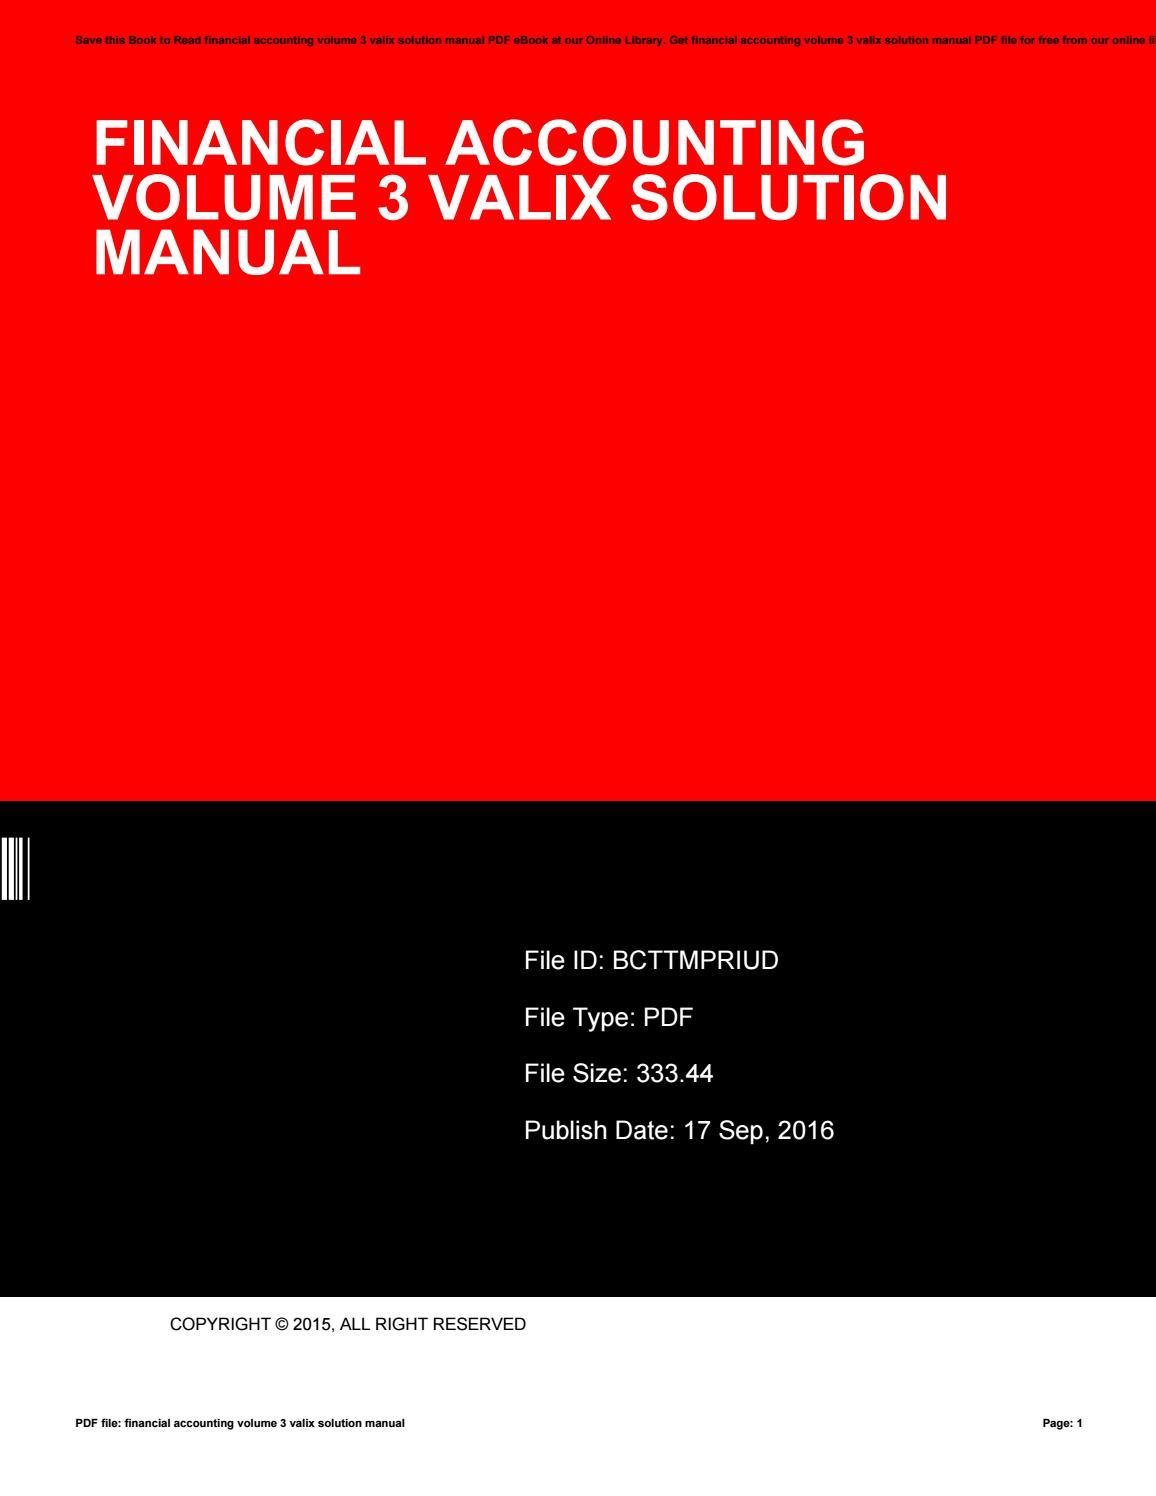 financial accounting 3 valix solution manual 2016 pdf free download